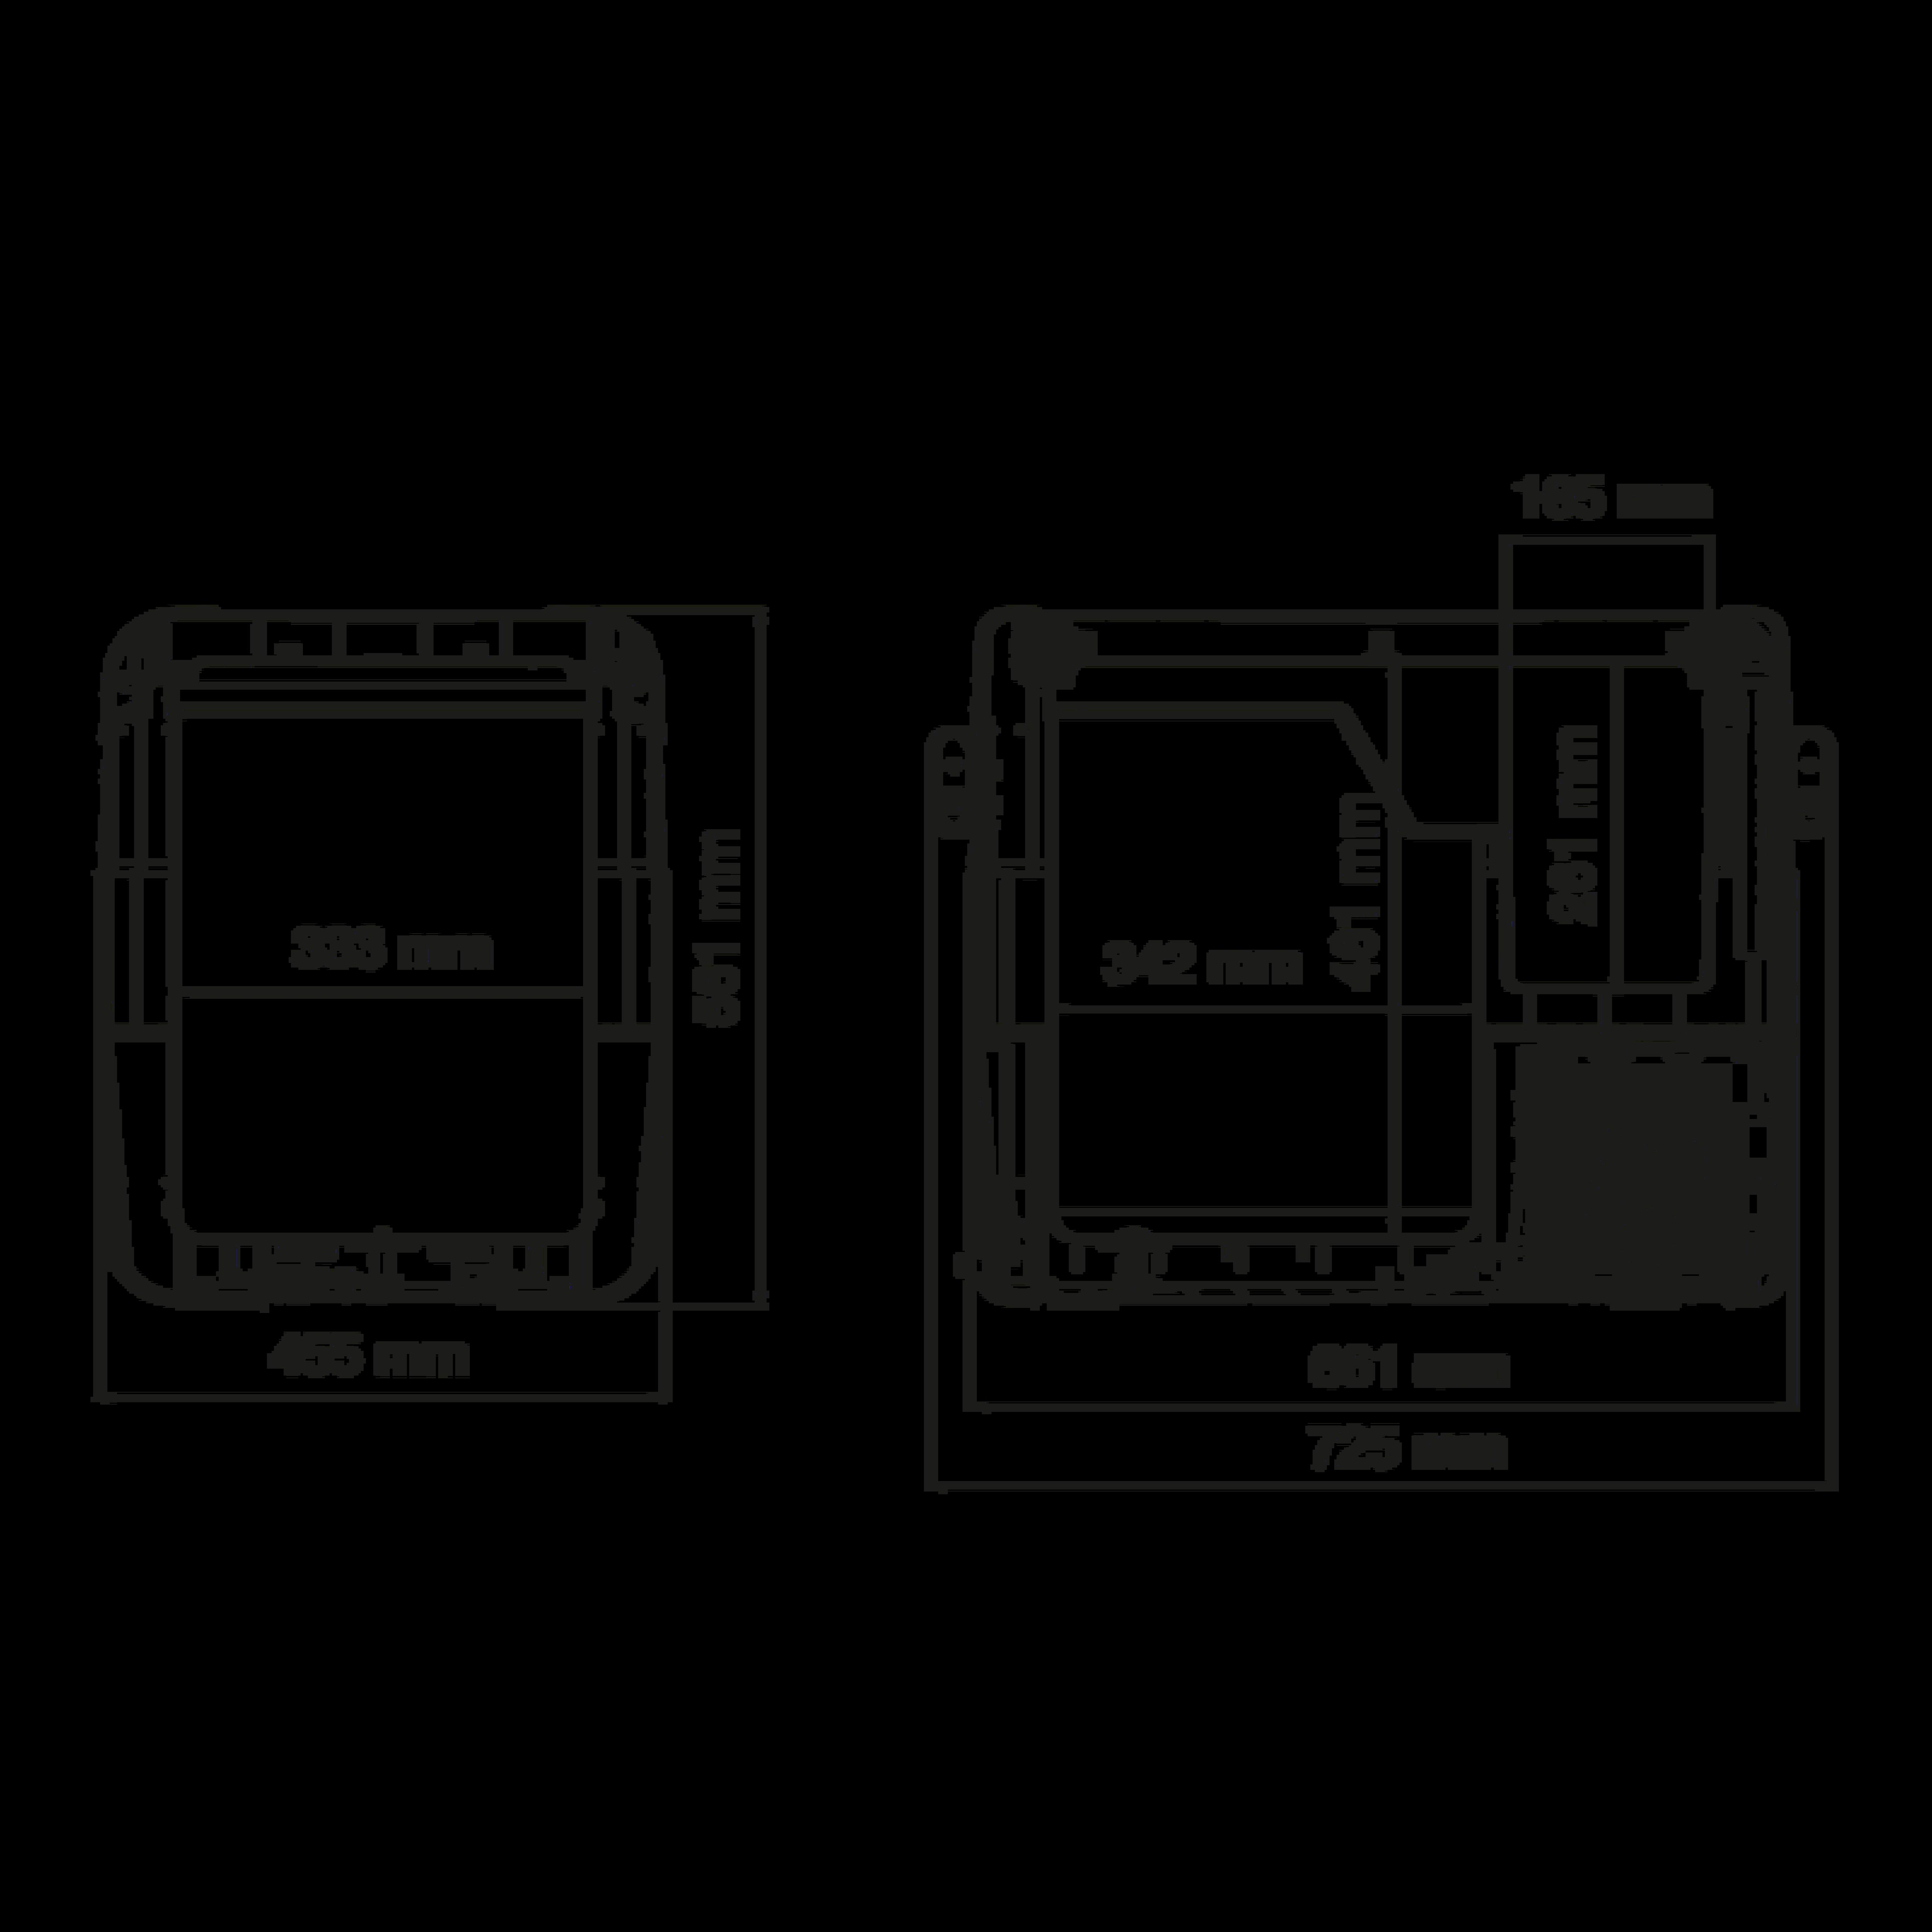 CFX 65 Dimensions